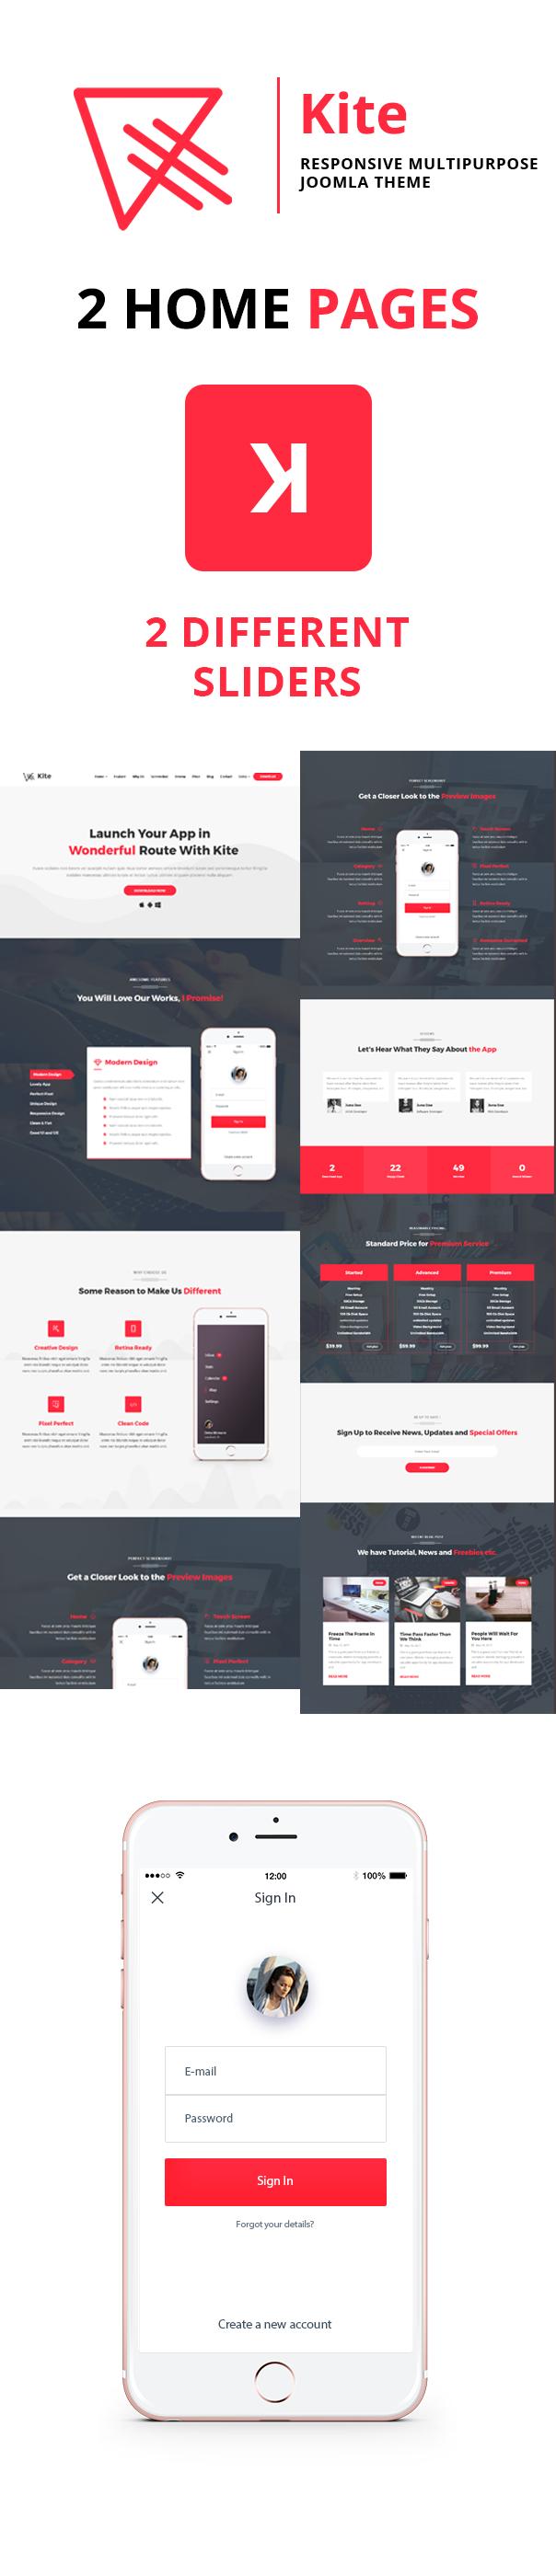 kite description - Kite - Responsive One Page Multipurpose Joomla Theme With Page Builder